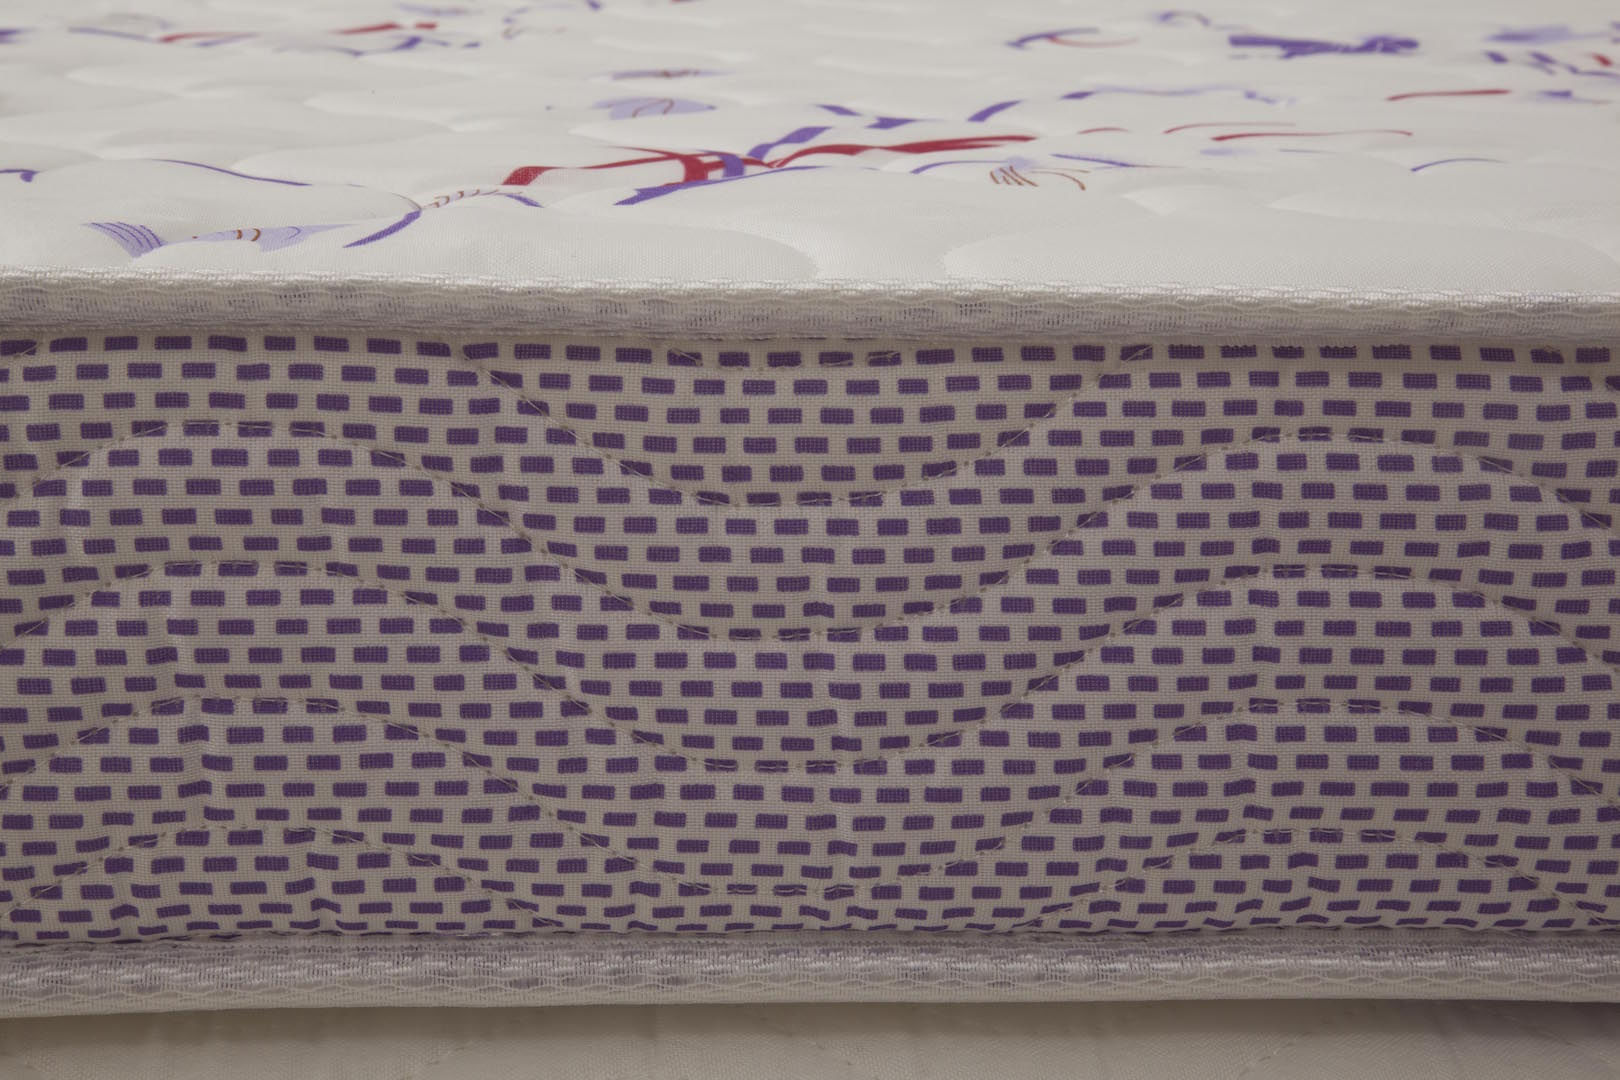 Colchao Physical Resistente Medio Solteiro 78 cm (LARG) Branco - 42935